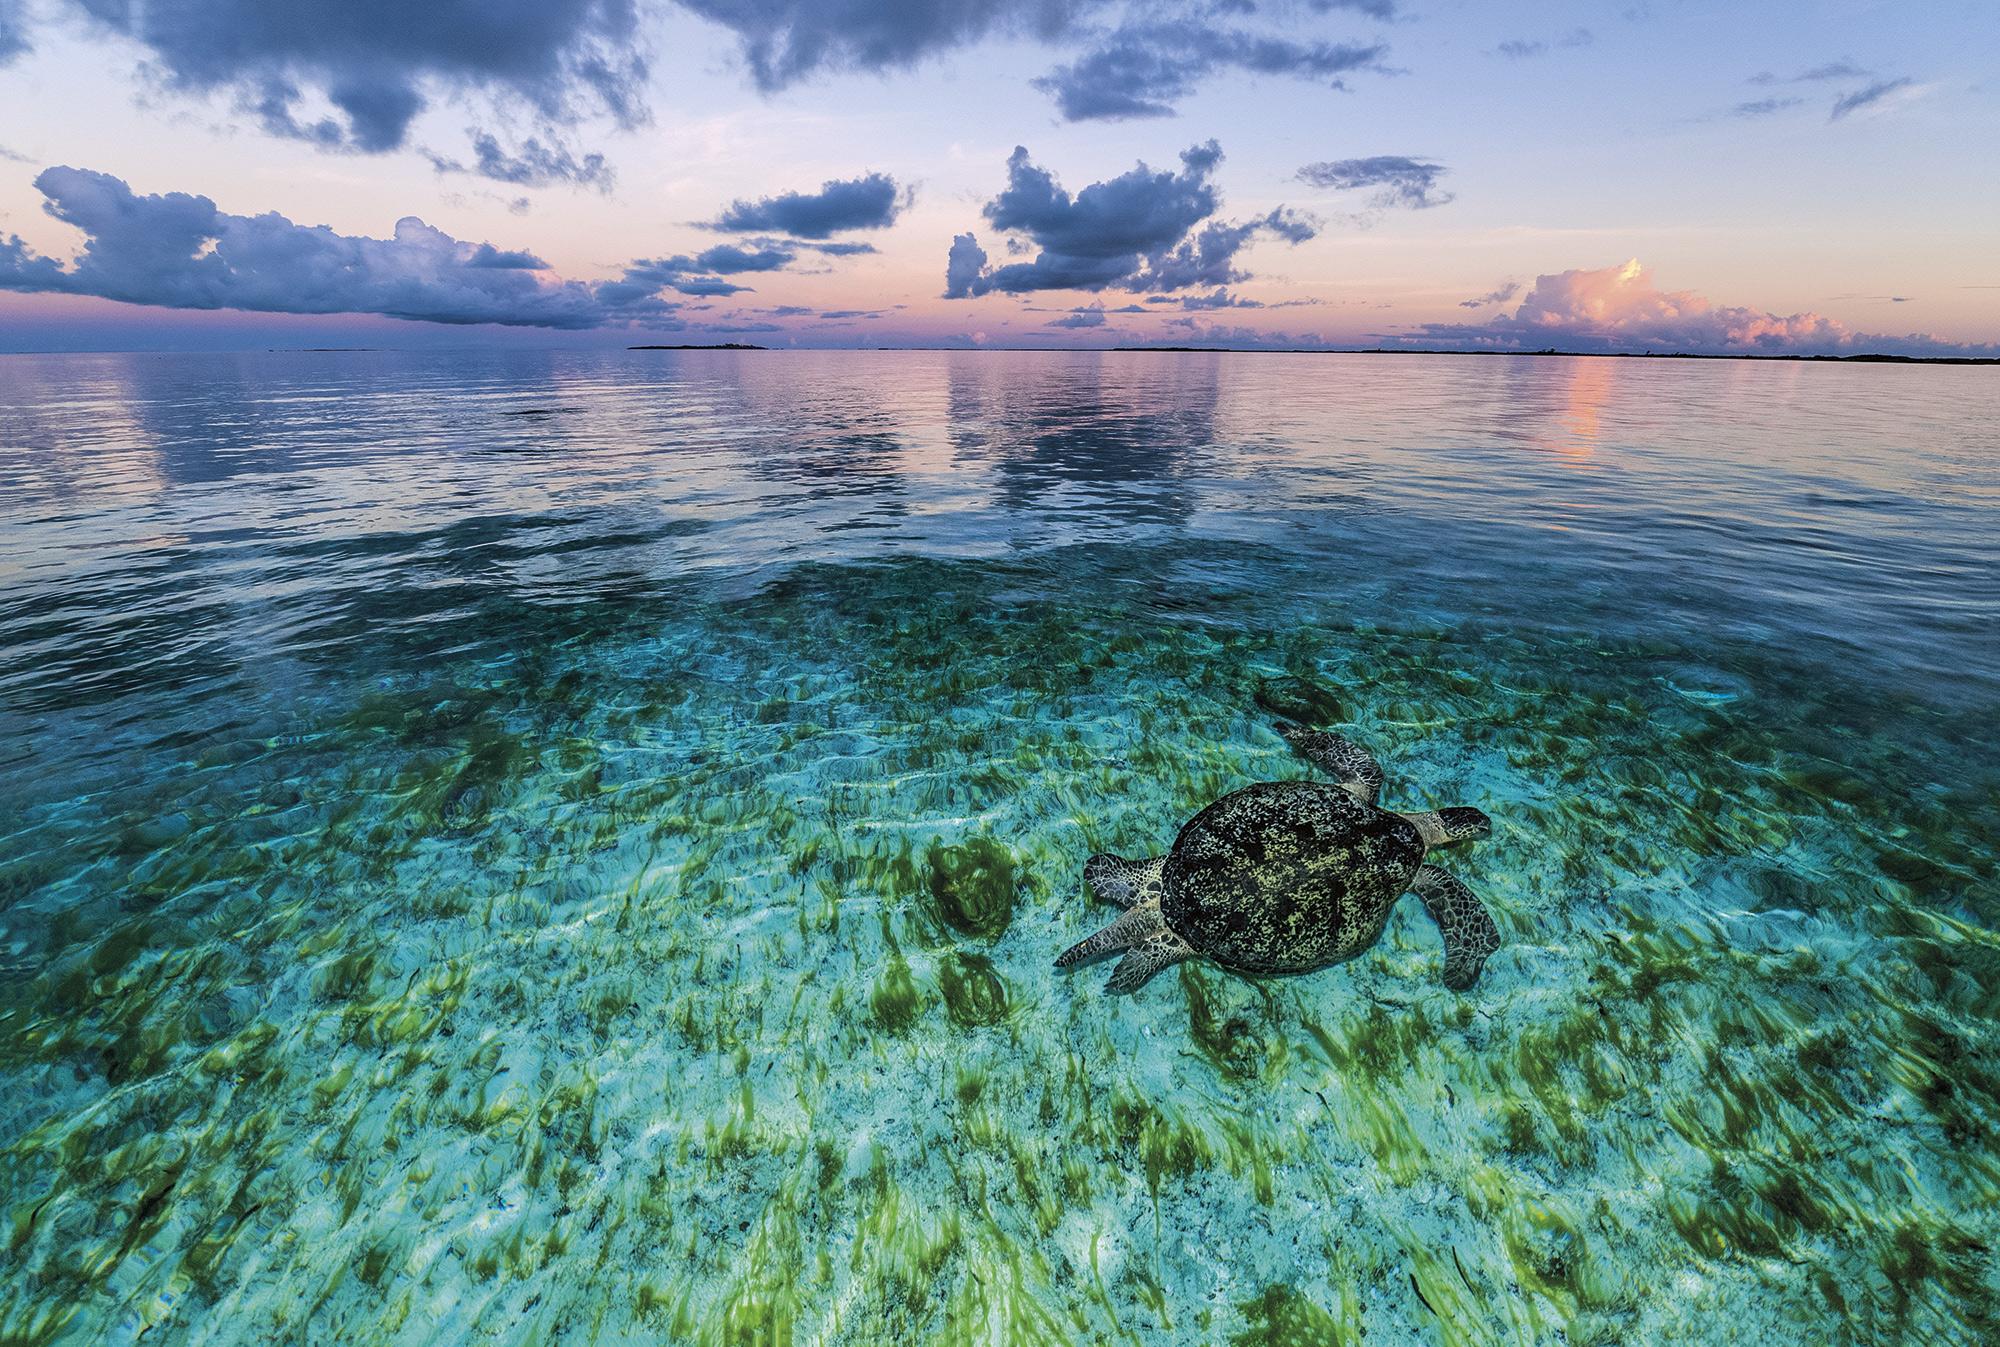 tortuga-aldabra-seychelles. Santuario oceánico